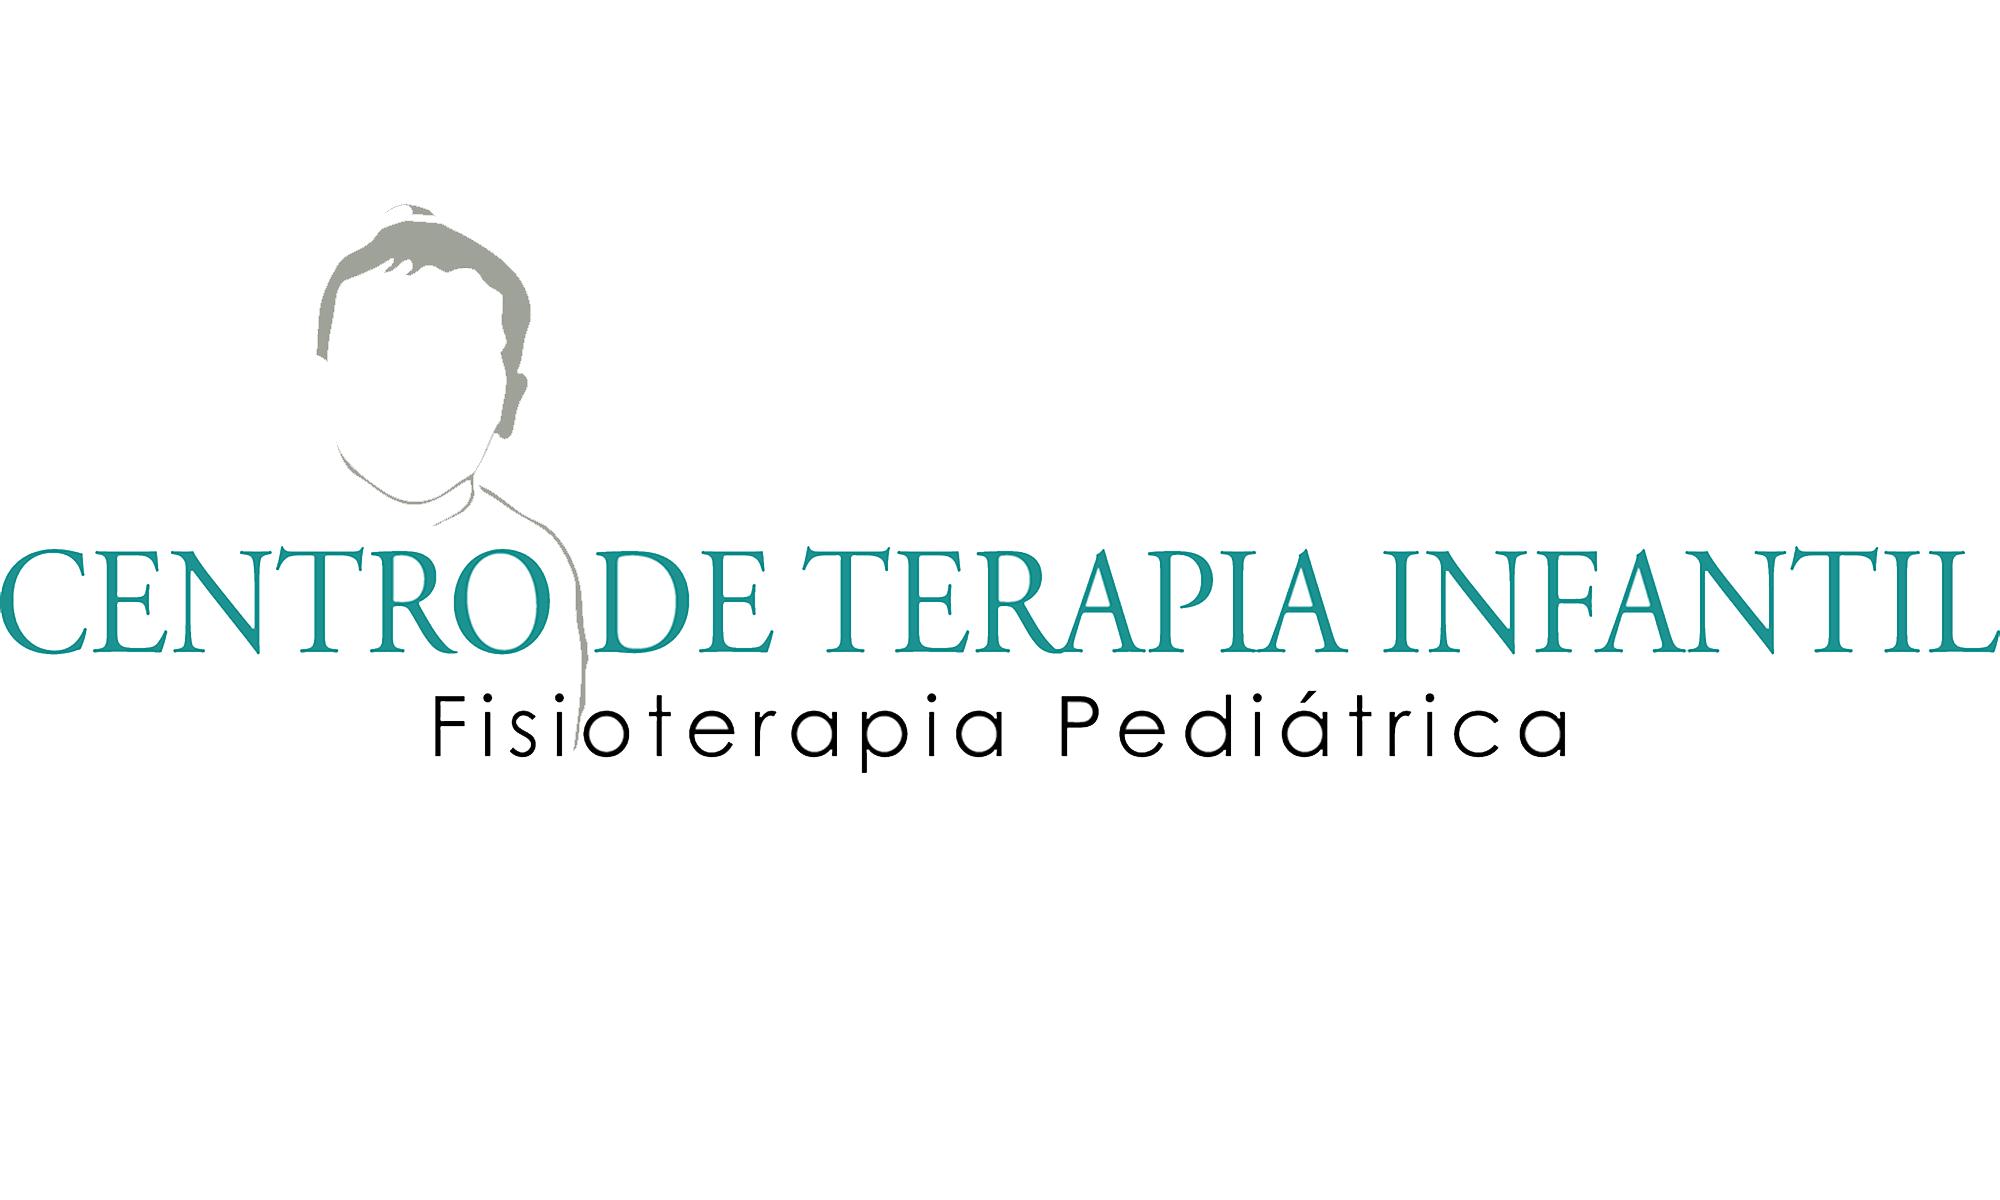 Centro de Terapia Infantil. Fisioterapia pediátrica